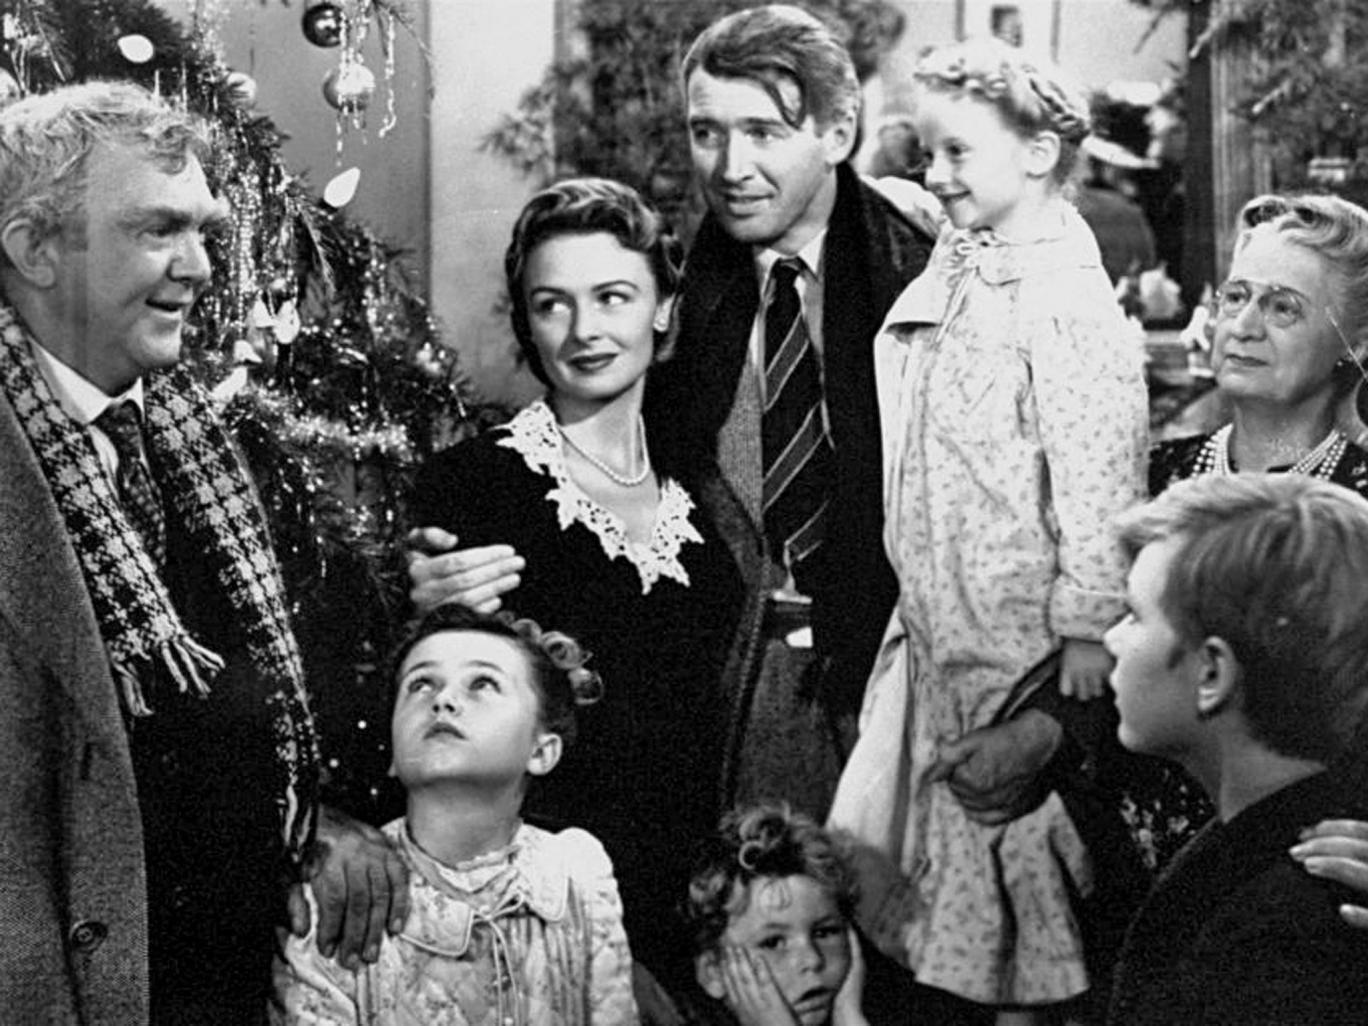 Family values: 'It's a Wonderful Life'